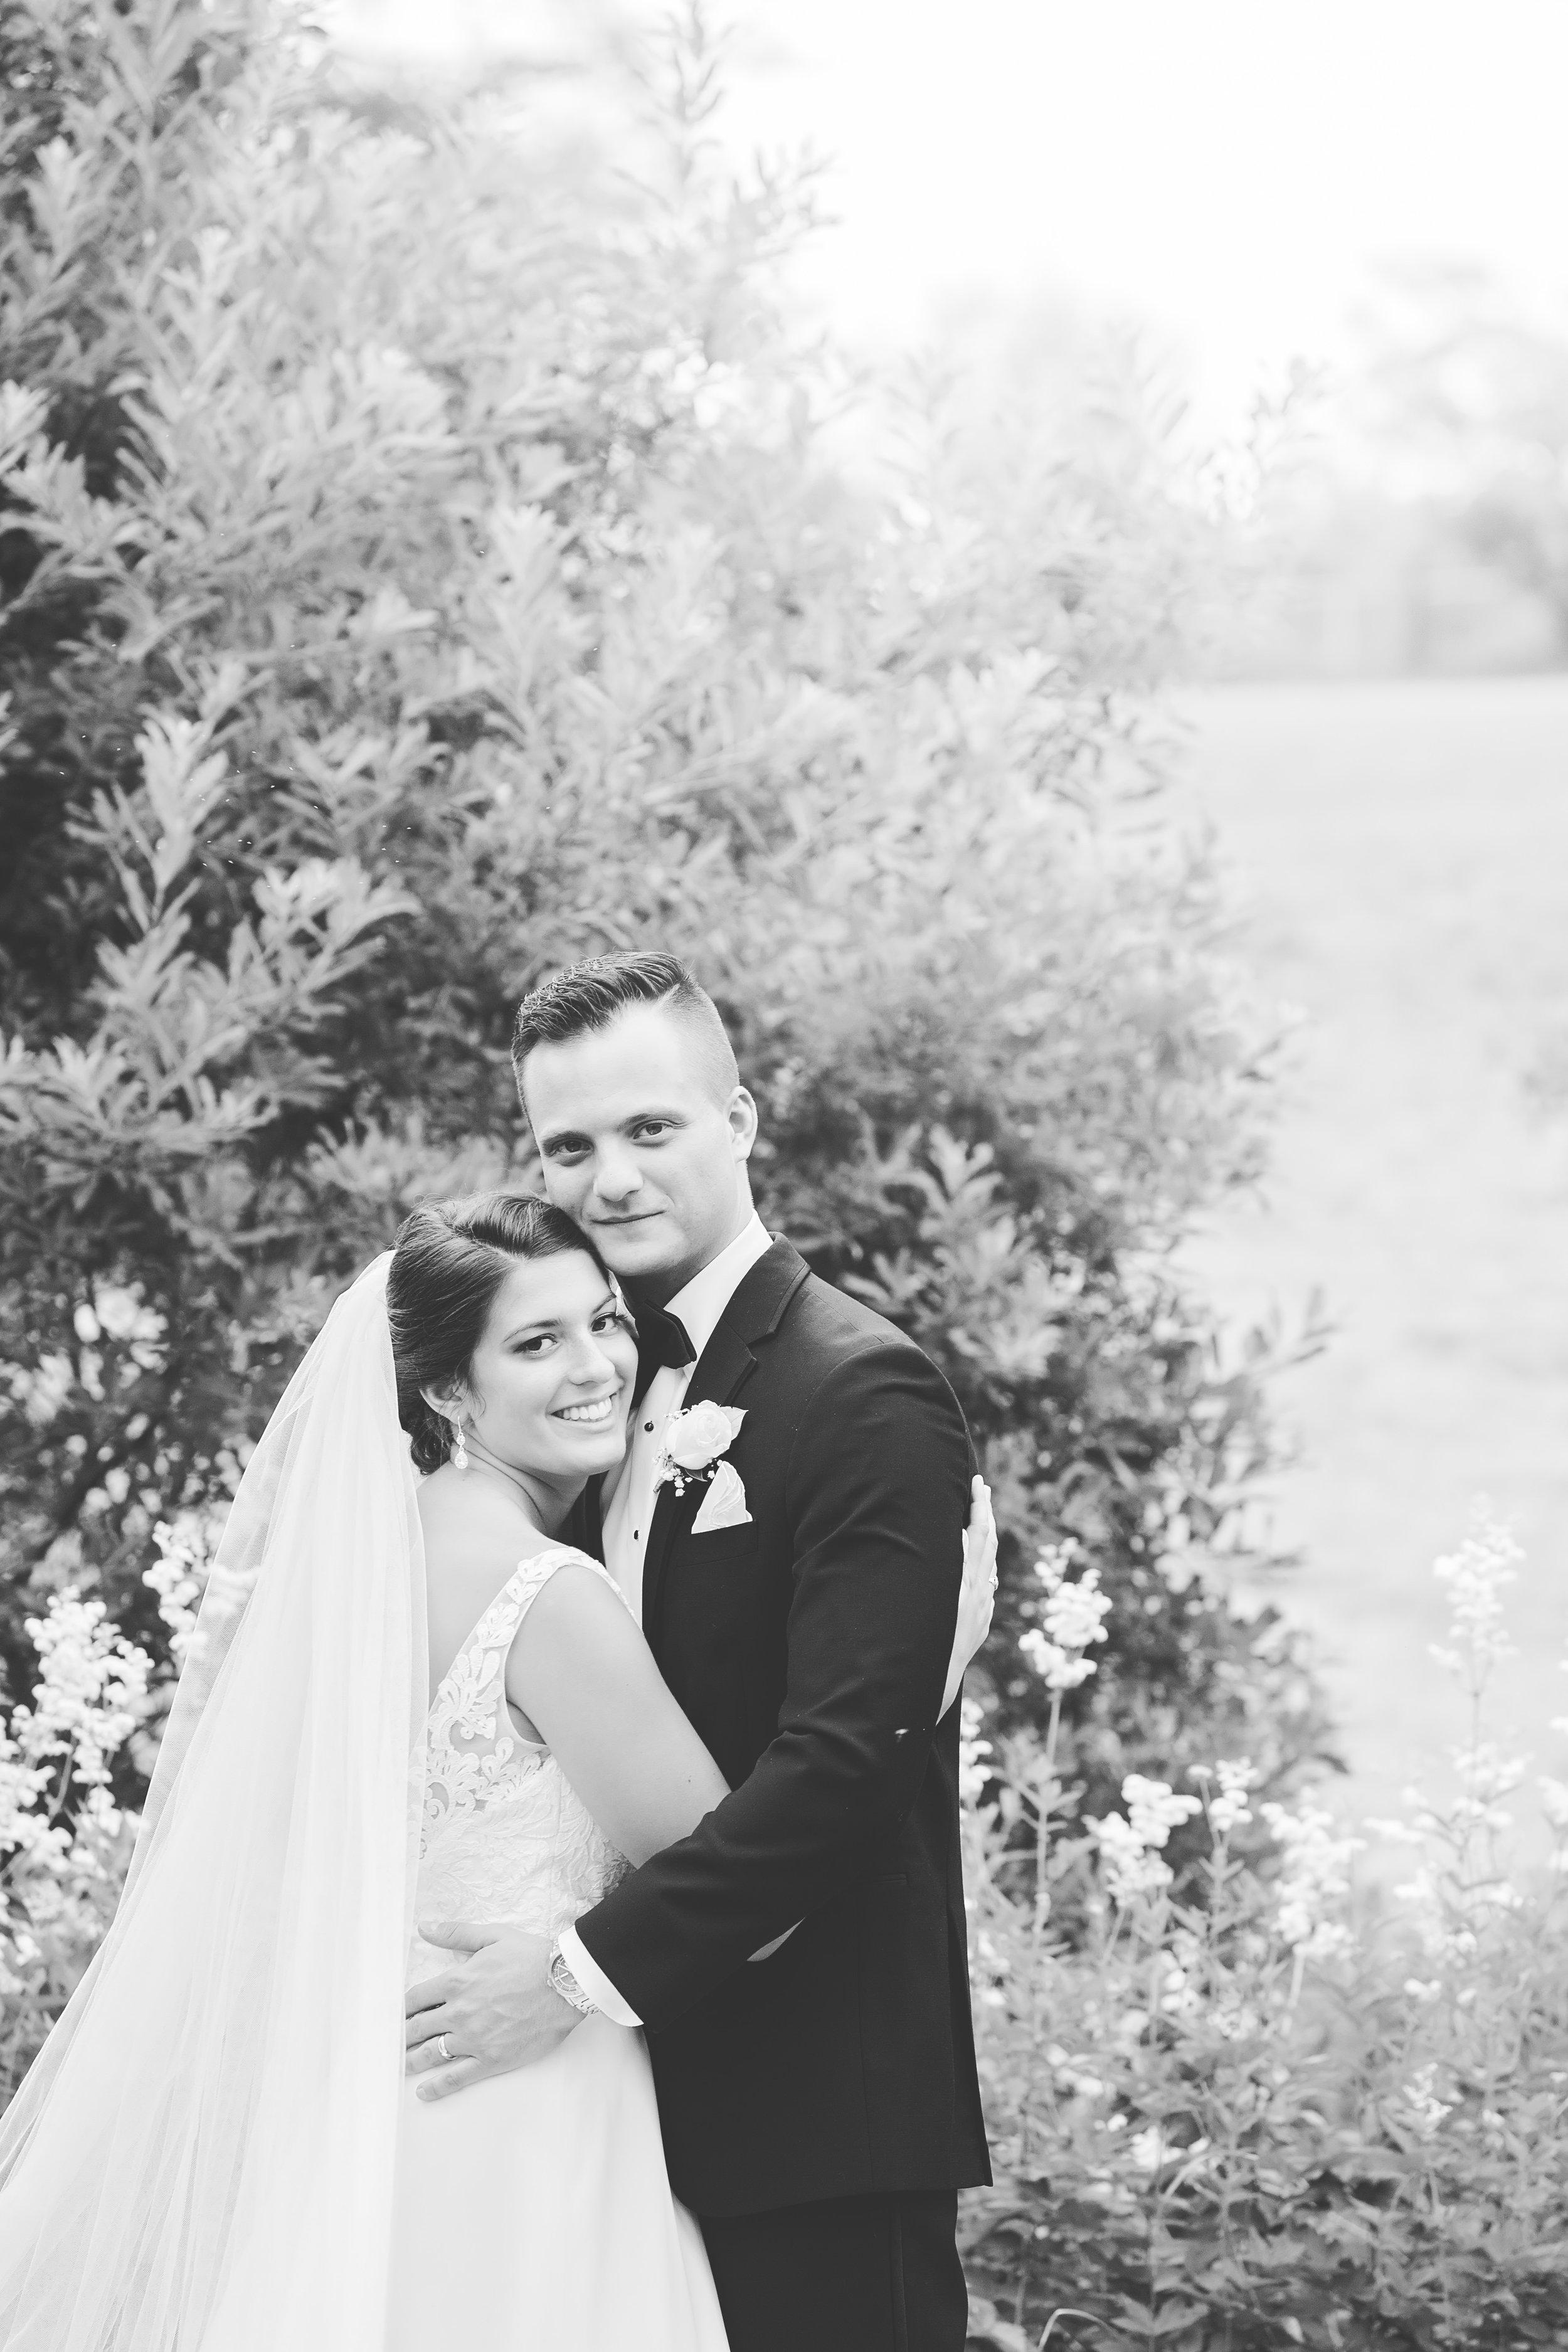 Piotrowski_Wedding-194.jpg